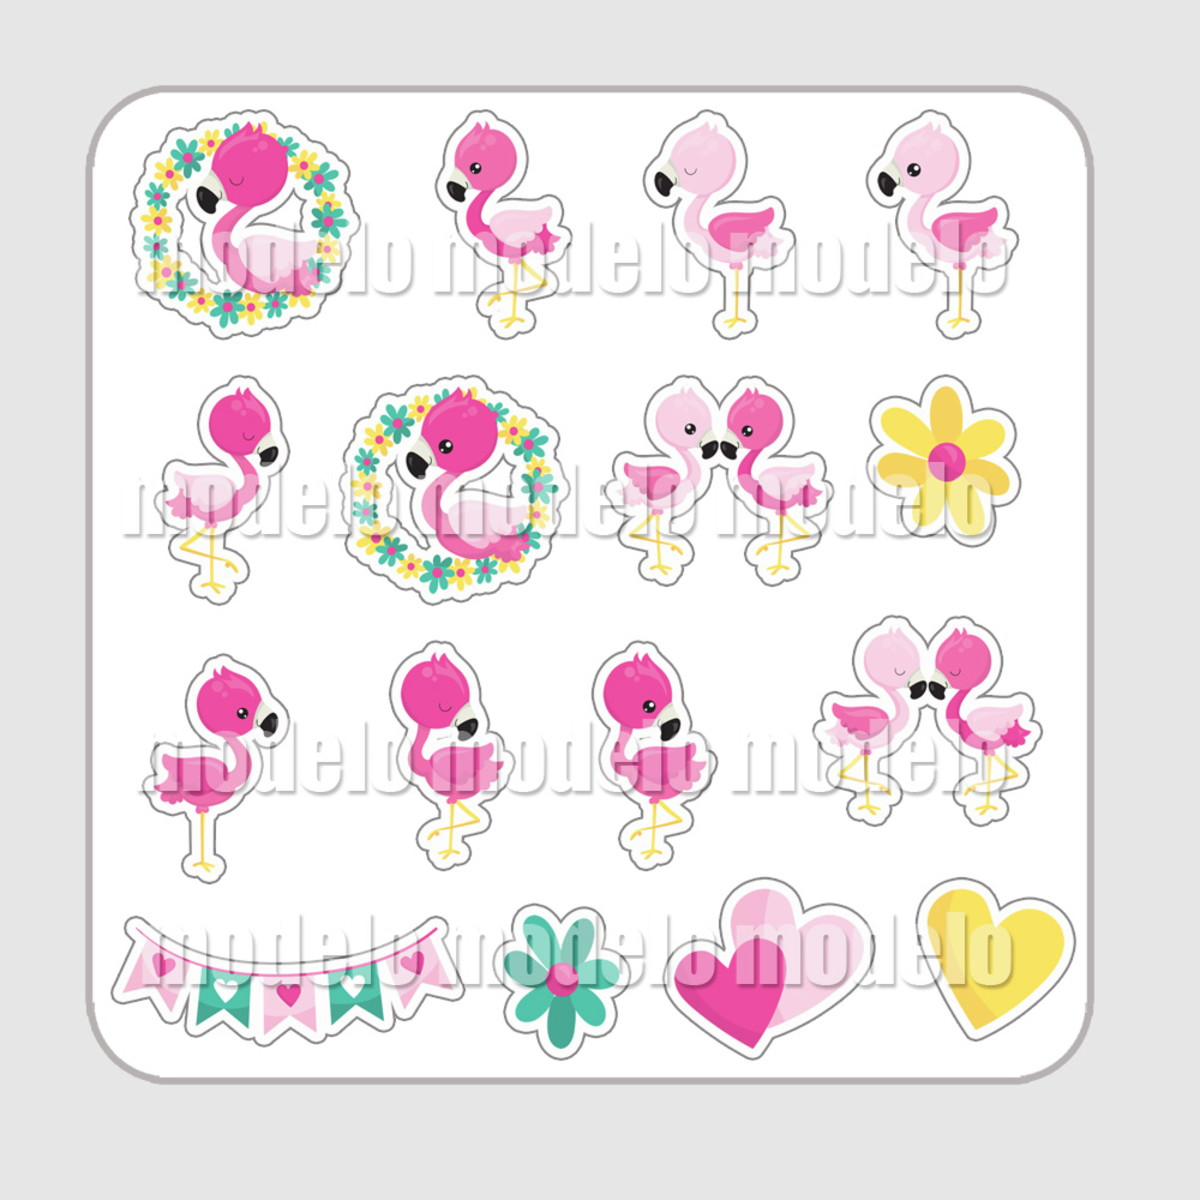 Adesivo Para Levantar Mama Funciona ~ Cartela de adesivos Flamingo cute no Elo7 Léa foto e arte (8F0ADA)